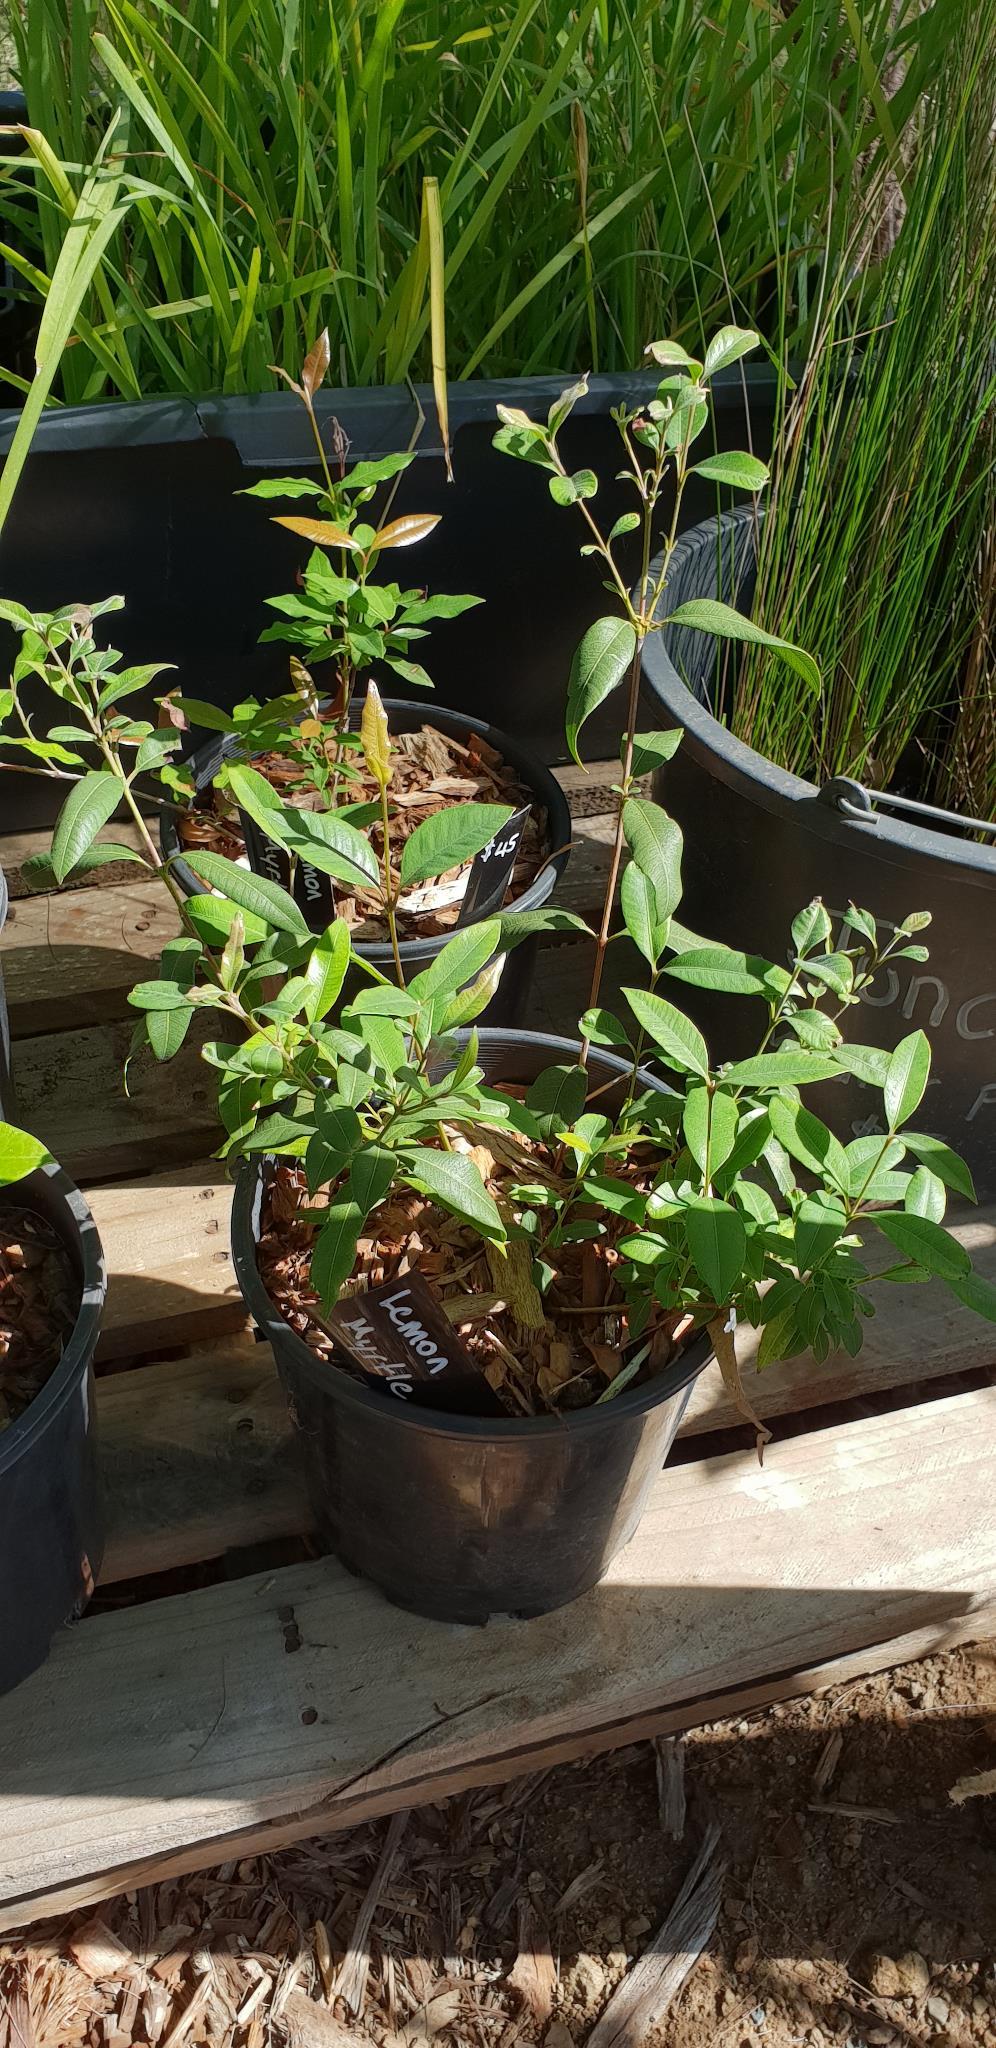 Lemon Myrtle - Backhousia citriodora